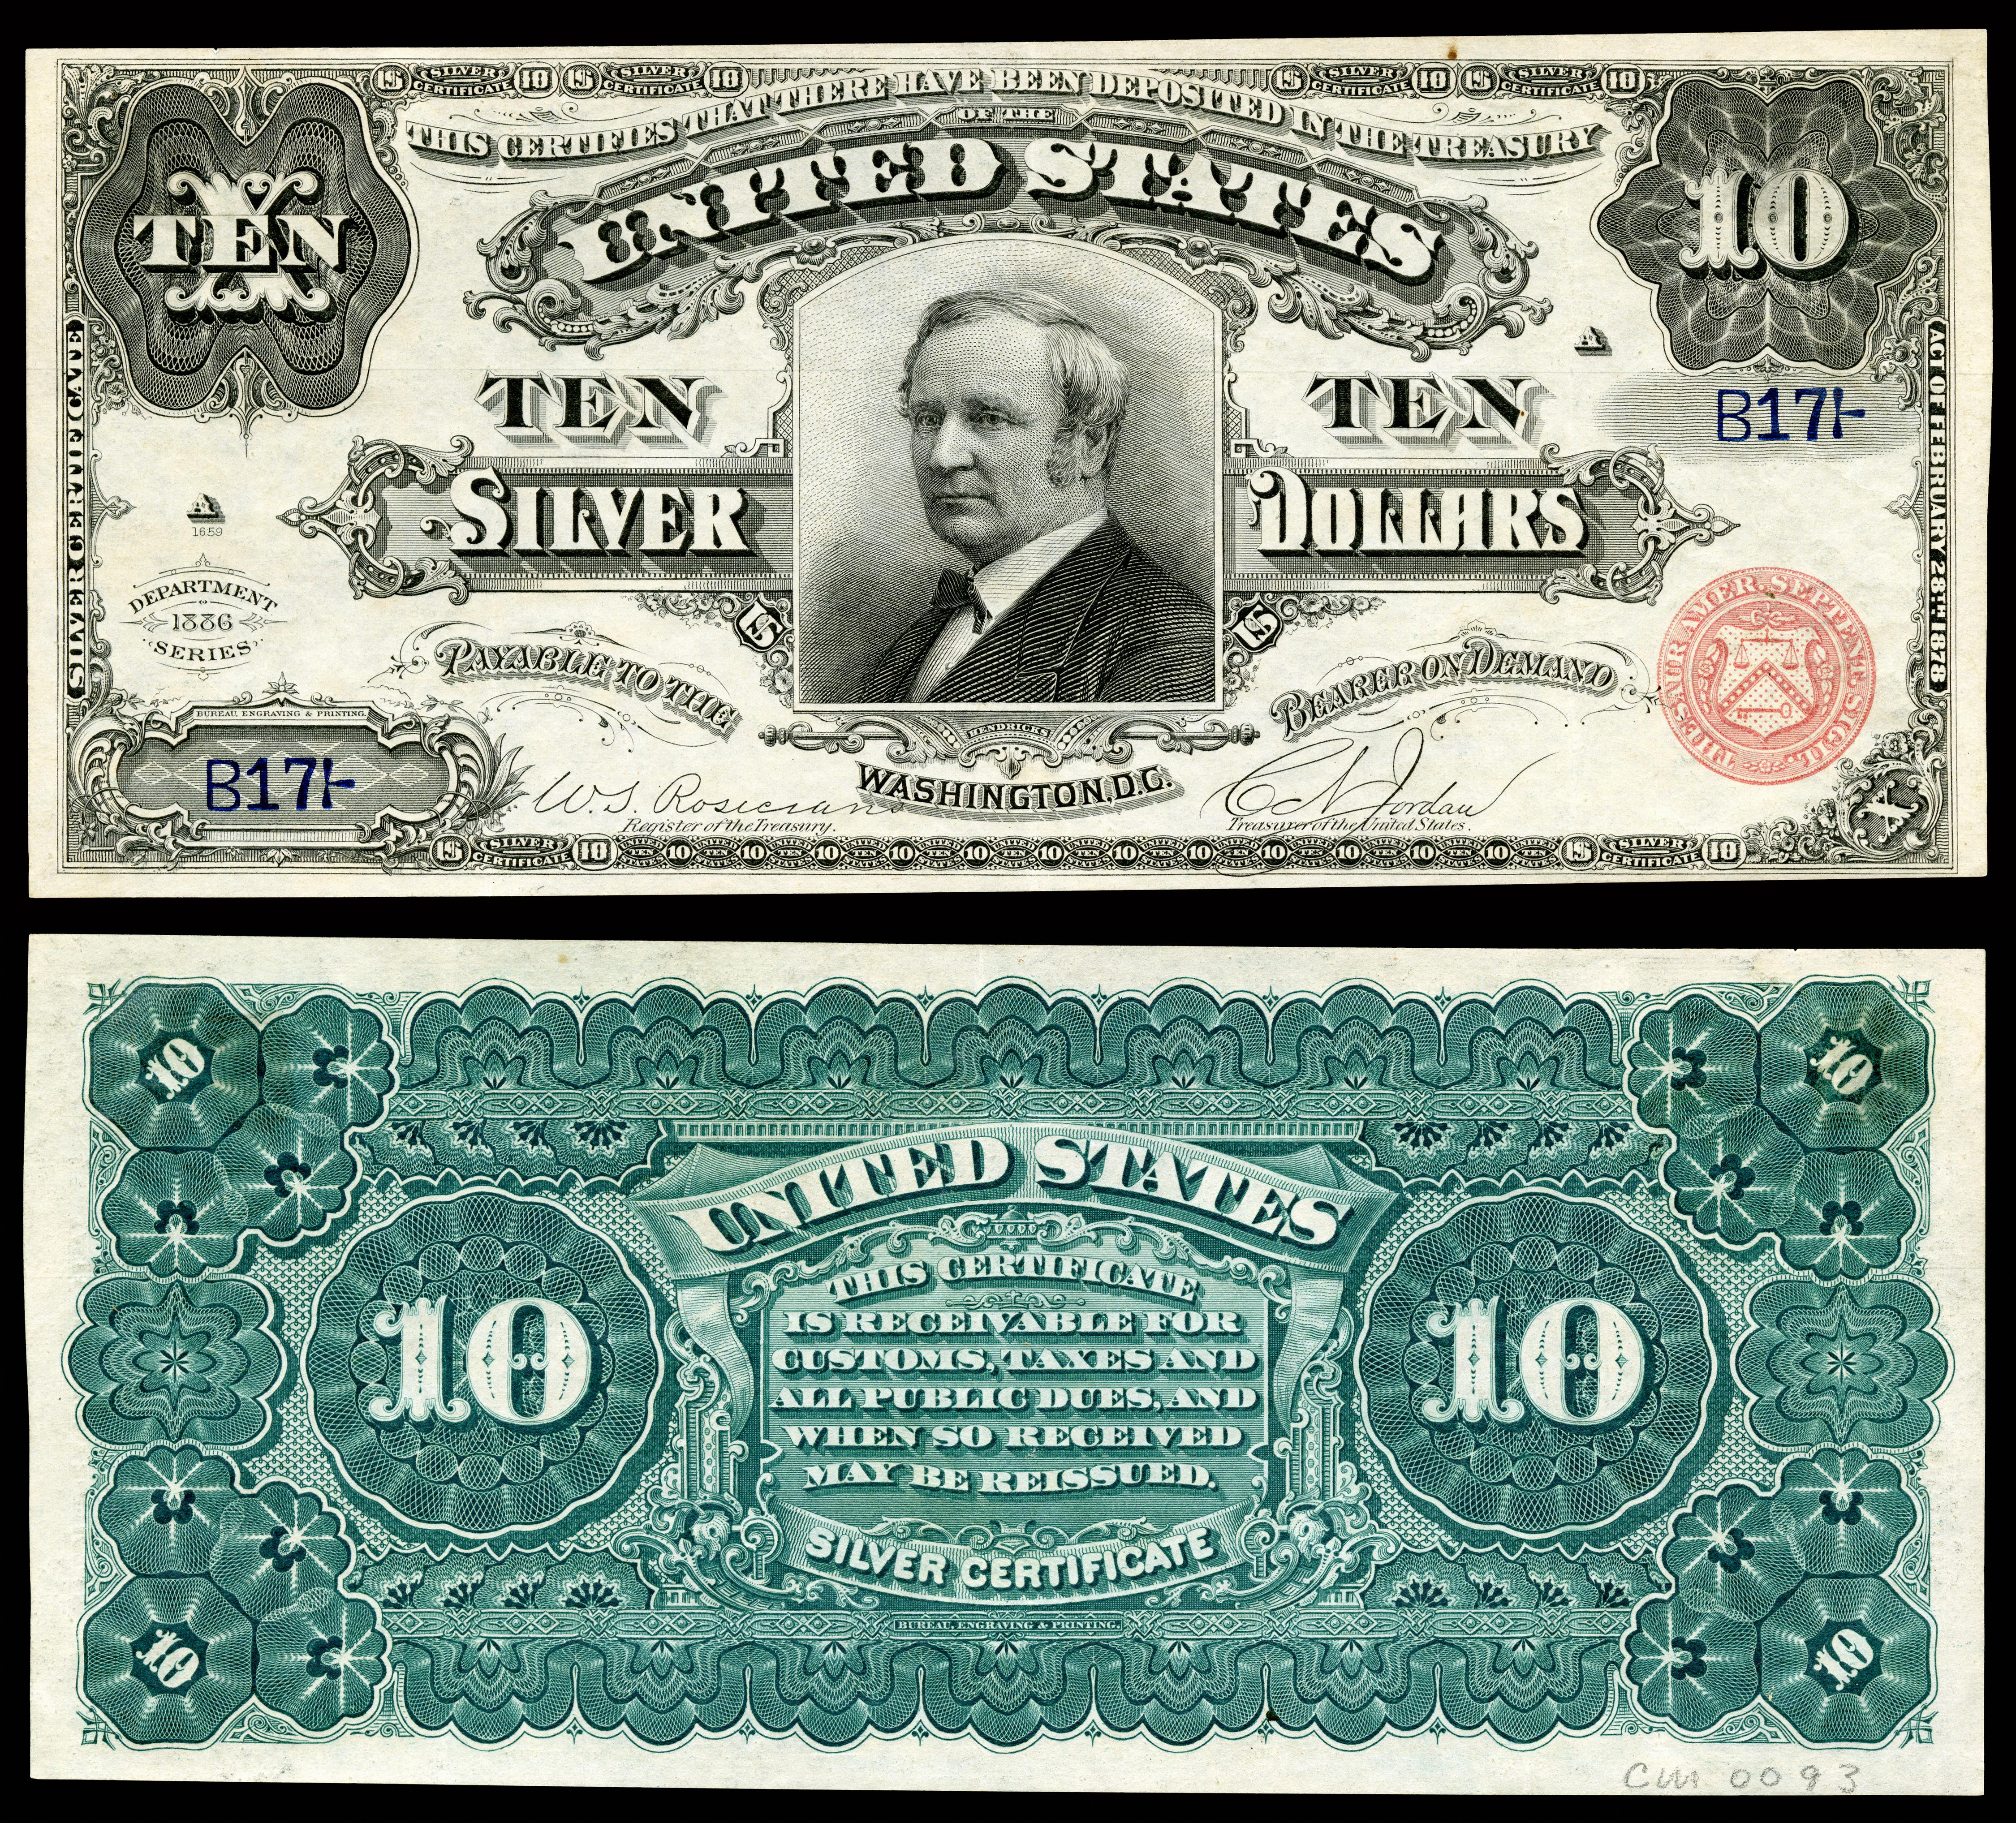 291 доллар банкноты 1993 года